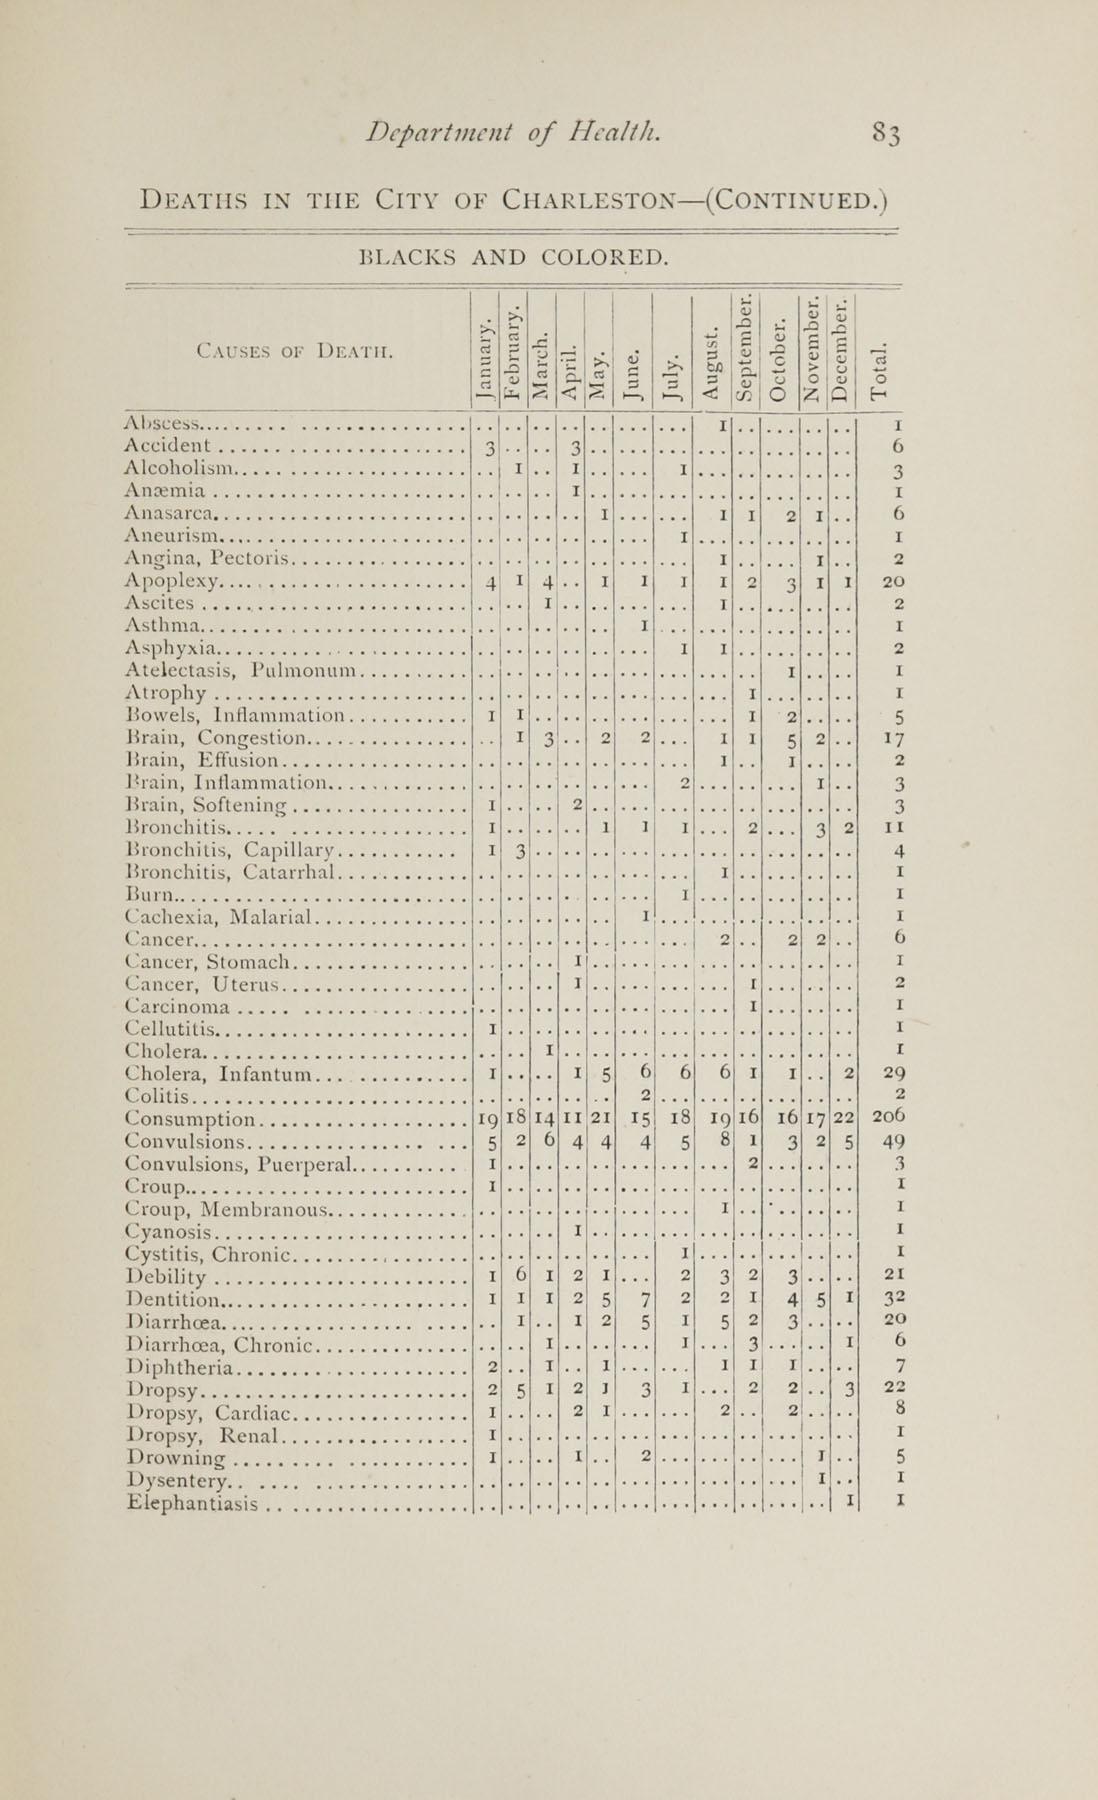 Charleston Yearbook, 1882, page 83